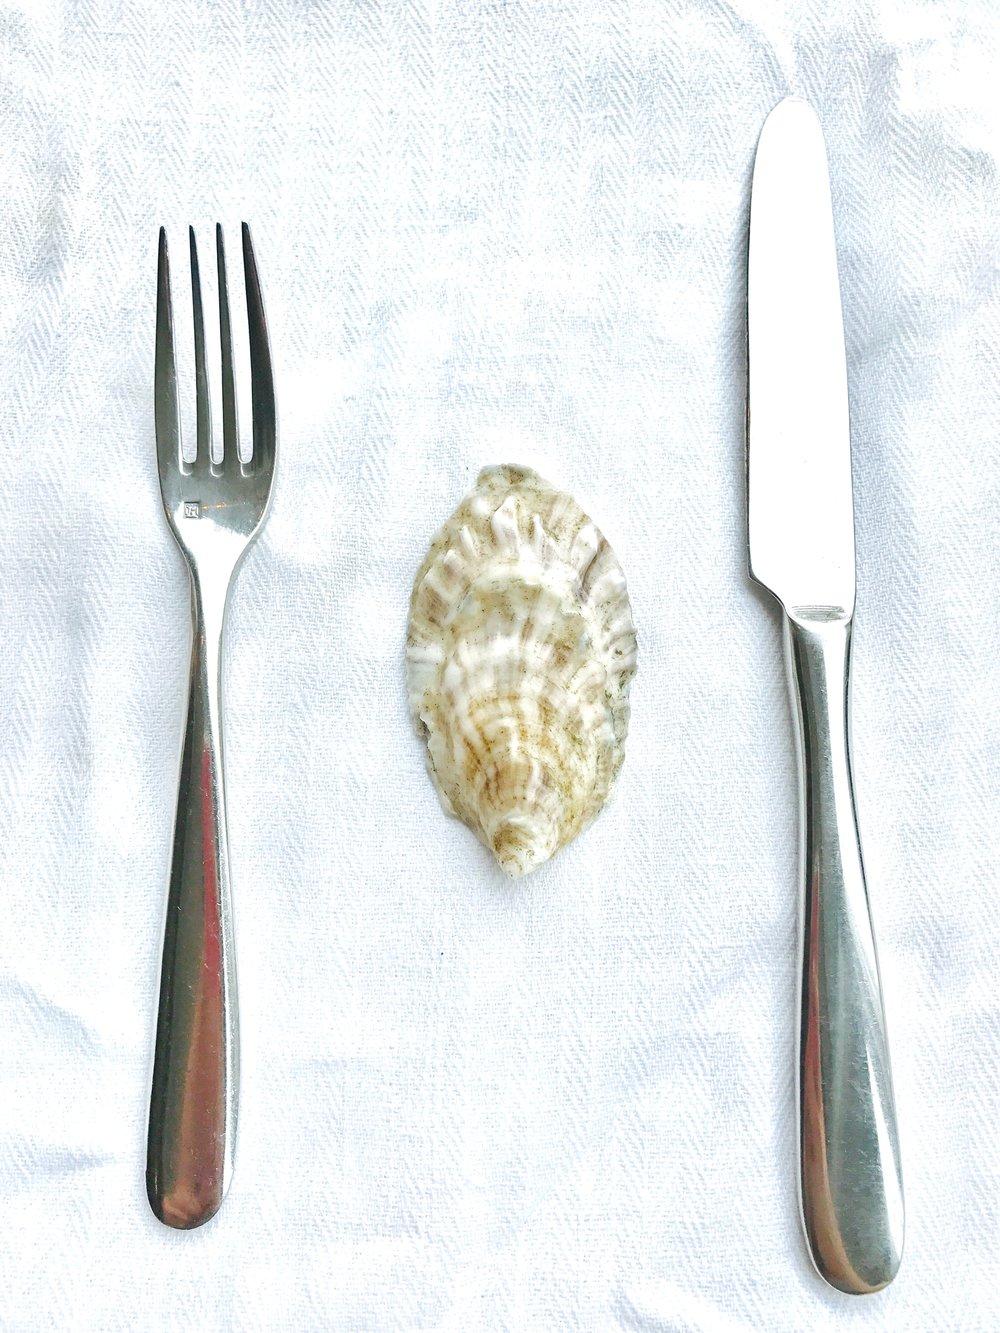 A thin, beautiful oyster shell.